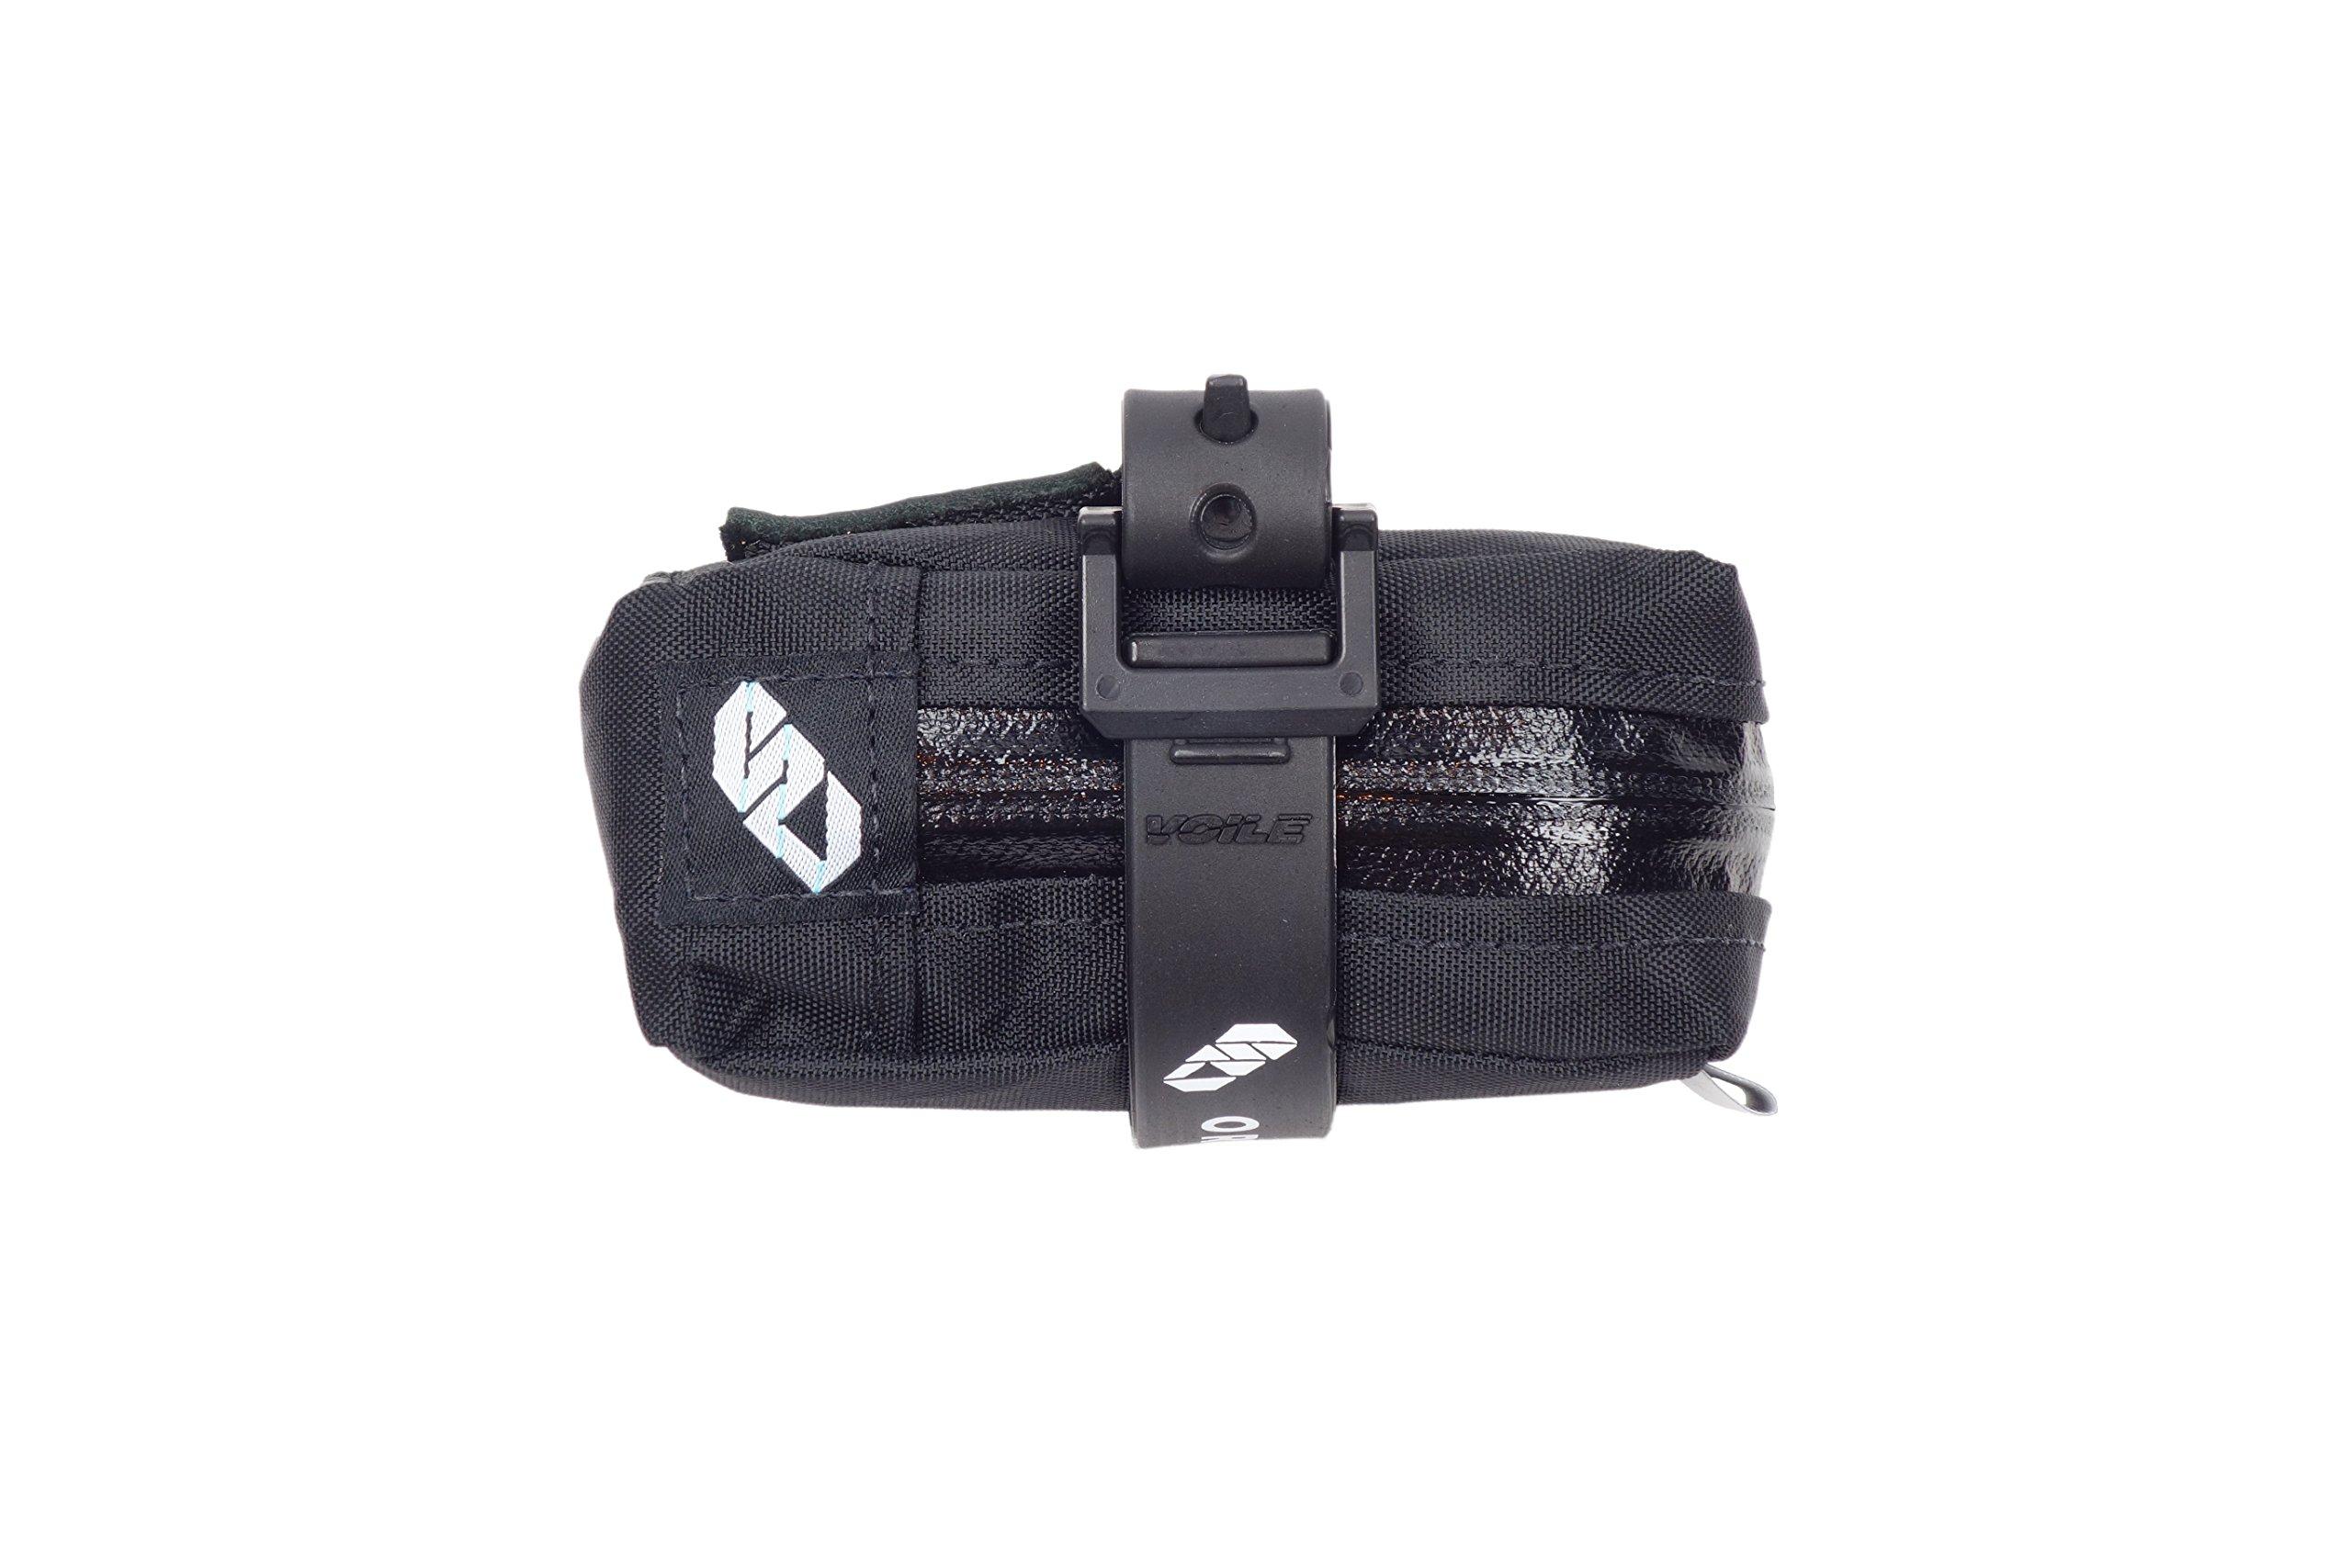 Orucase Saddle Bag - Featuring Ski Strap Attachment System